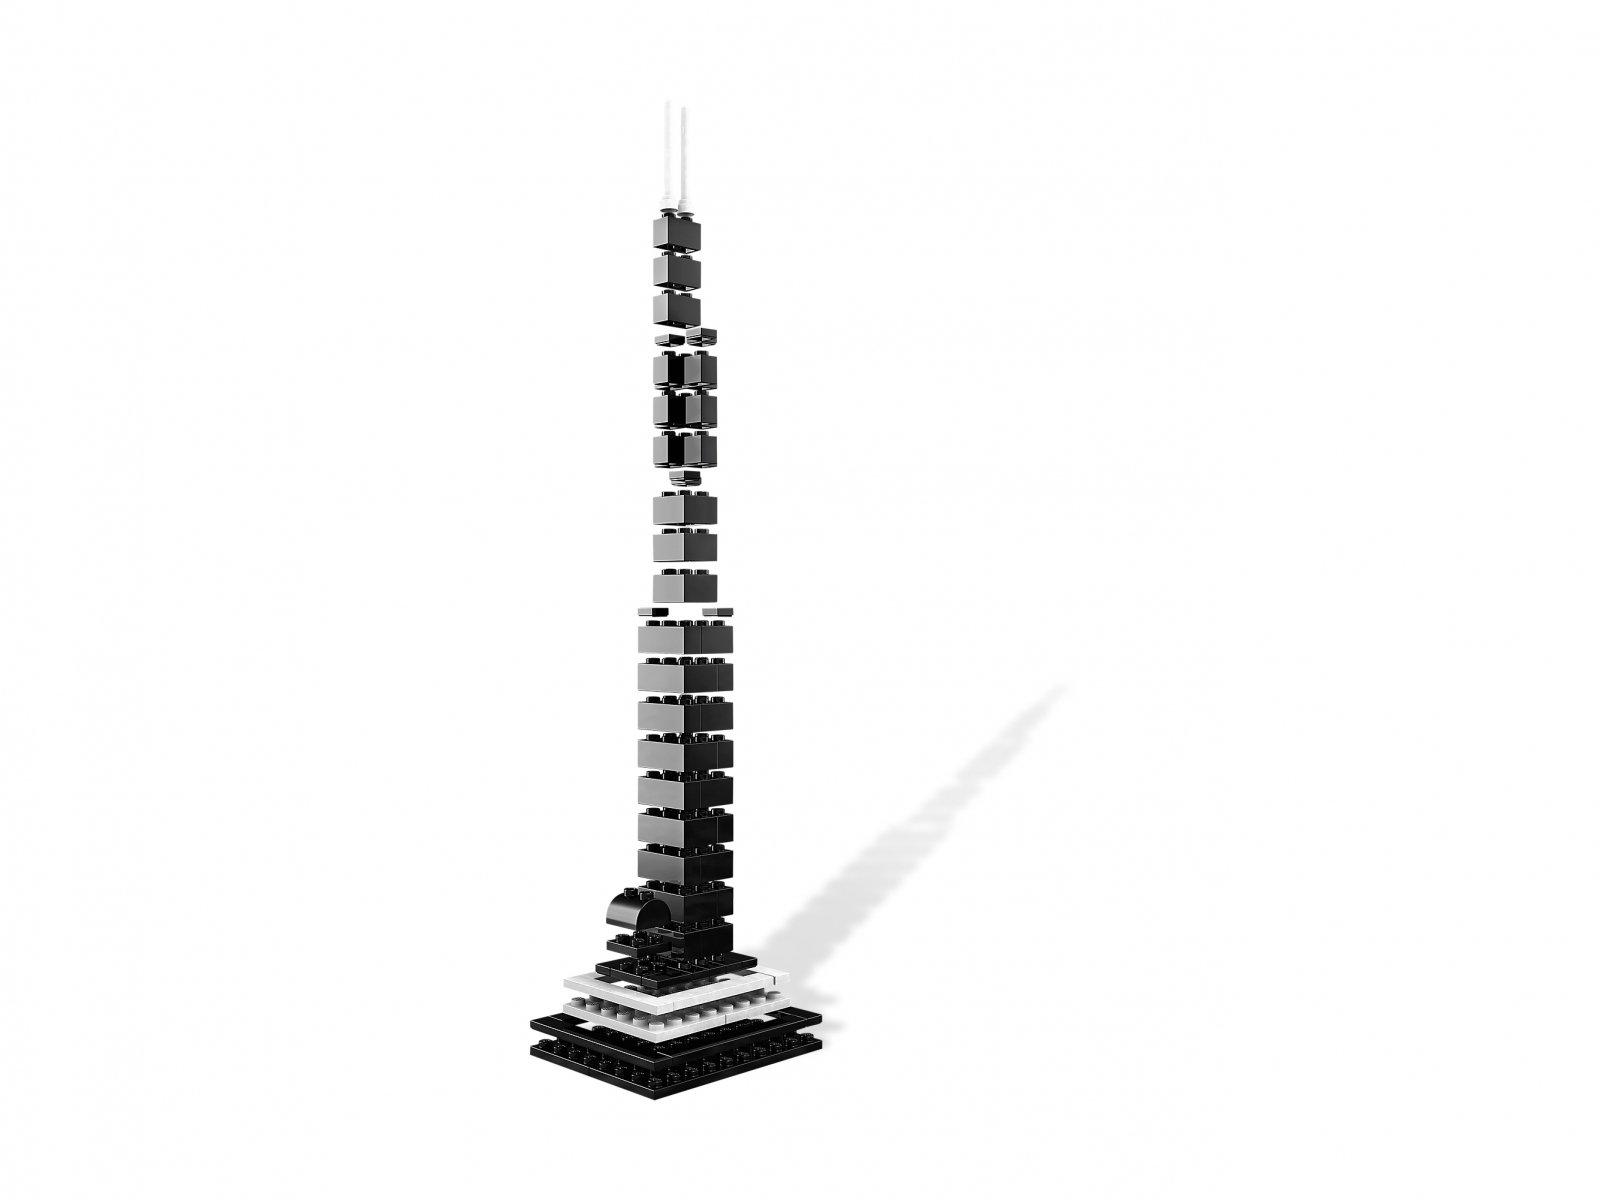 LEGO 21000 Architecture Willis Tower